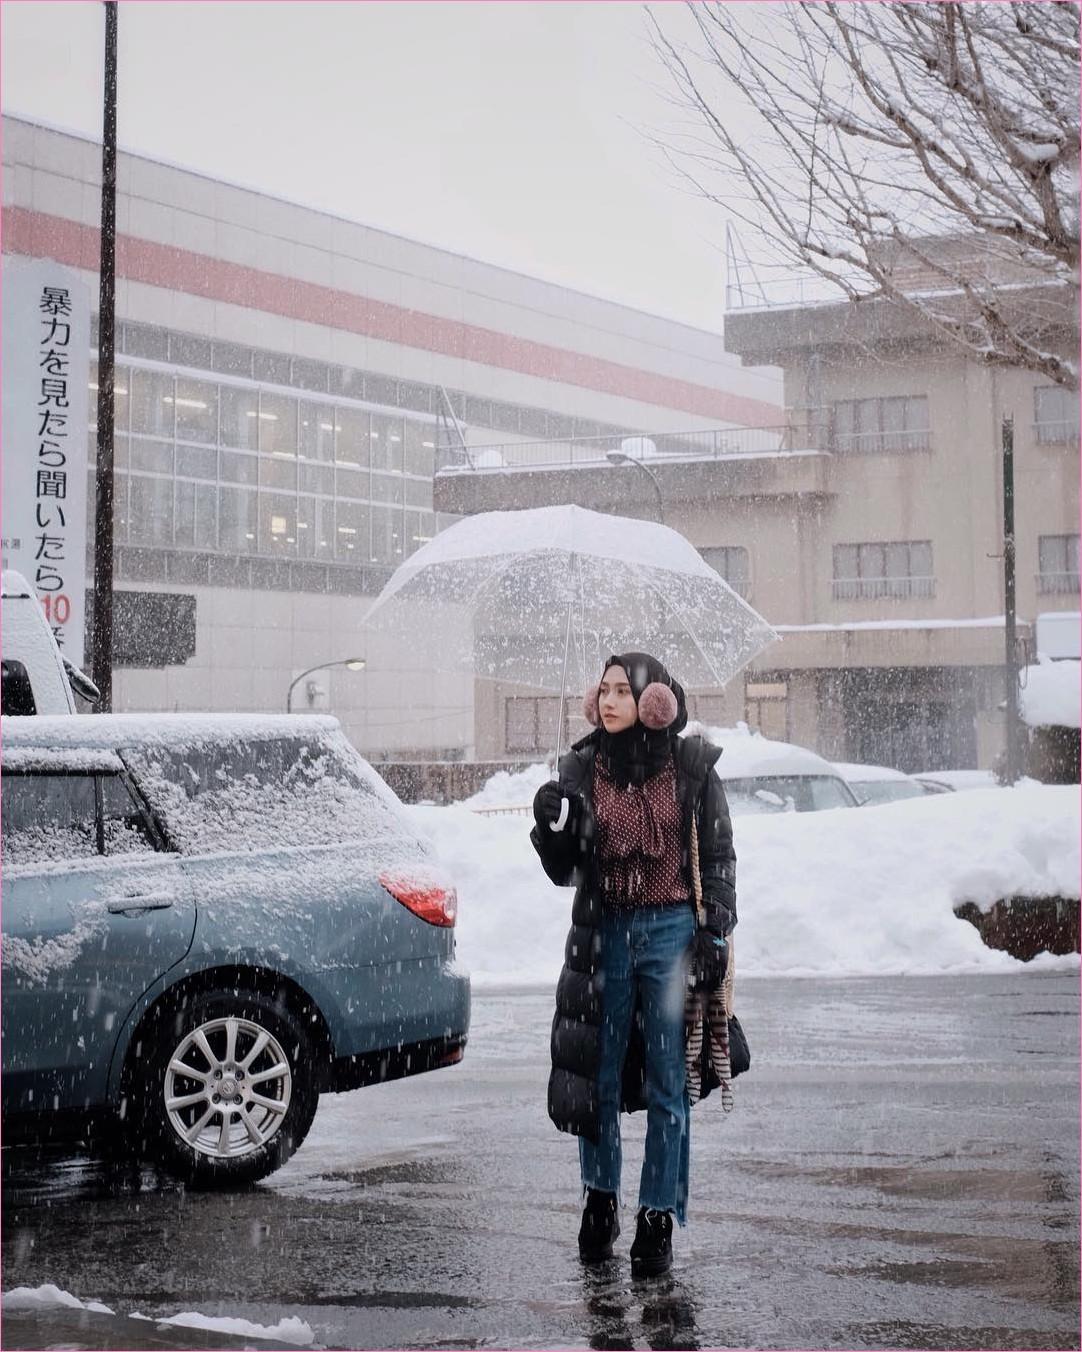 Outfit Baju Traveler Berhijab untuk Keluar Negri Ala Selebgram 2018 blouse merah bata jeans denim sobek cardigan jacket pashmina diamond boots high heels sarung tangan hitam earmuff krem tua slingbags rotan ootd outfit trend coat